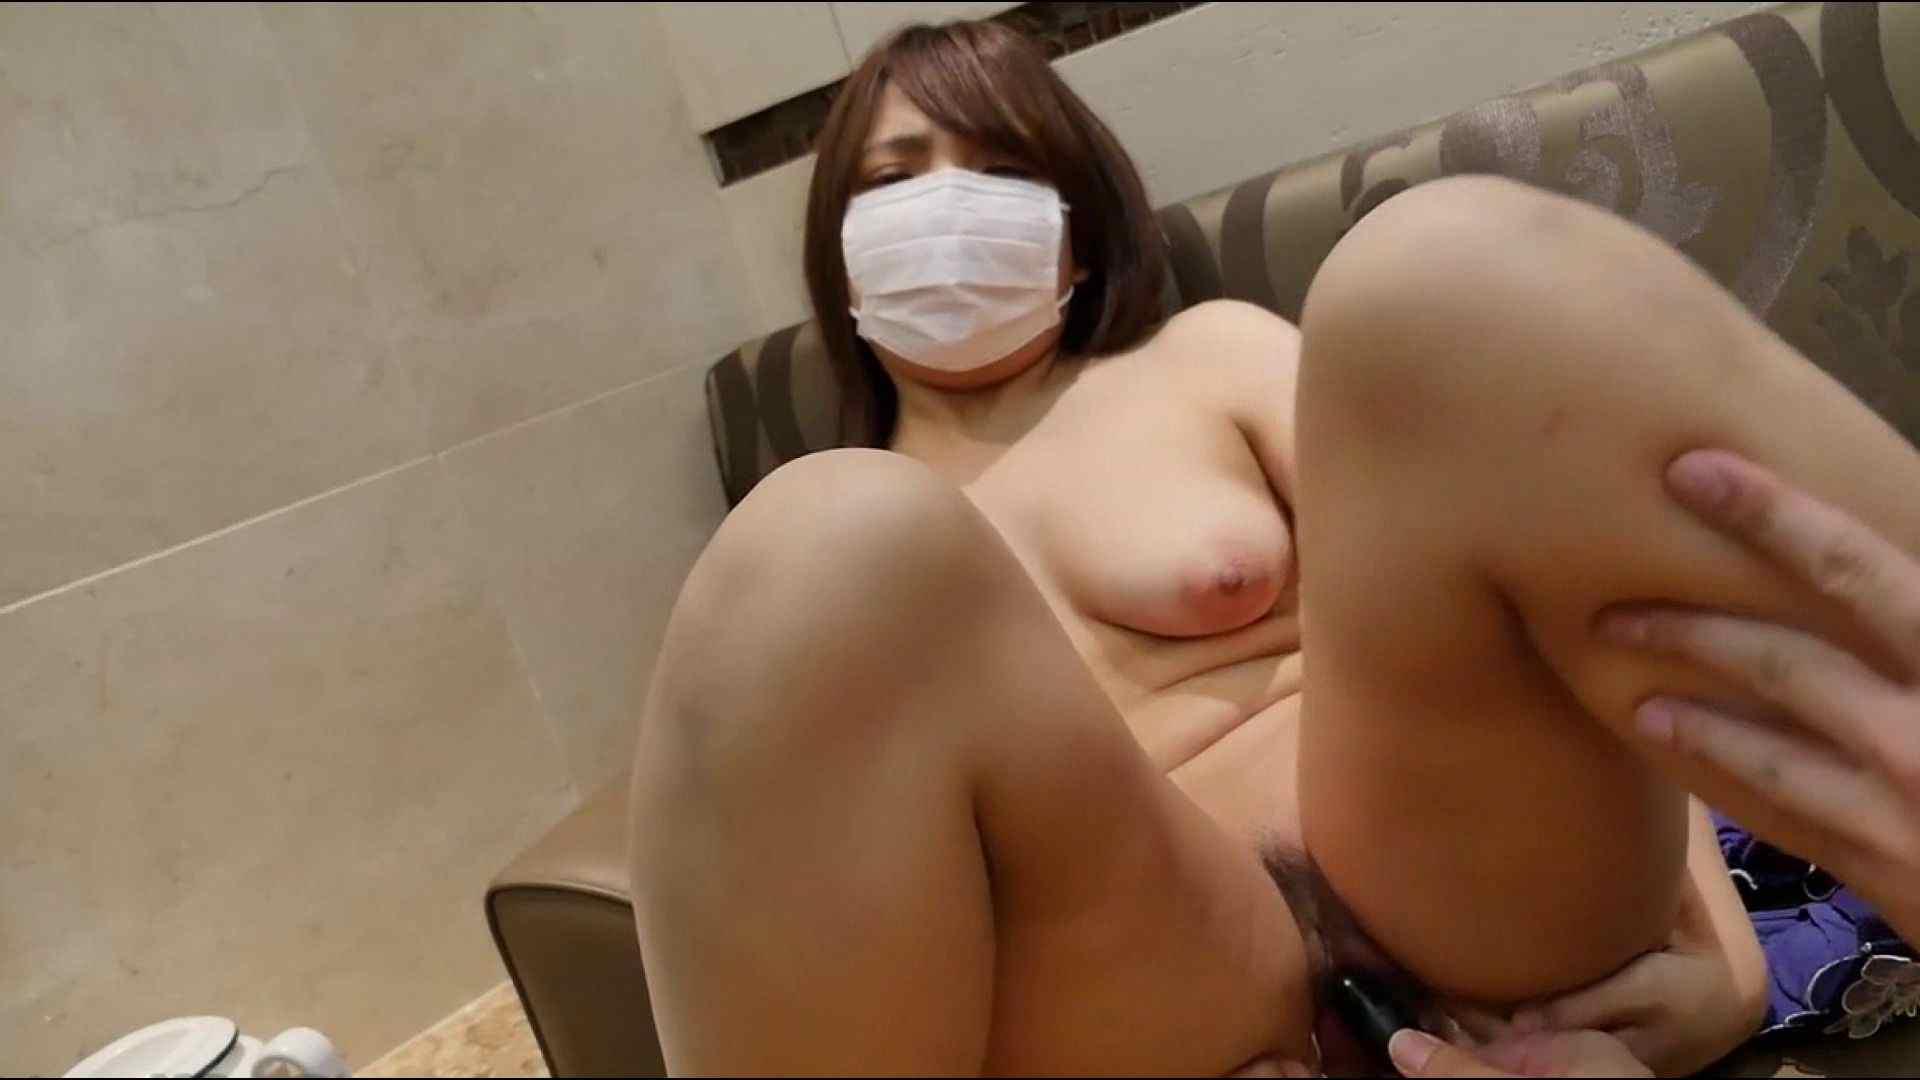 S級厳選美女ビッチガールVol.41 前編 OL女体   美女  105連発 99